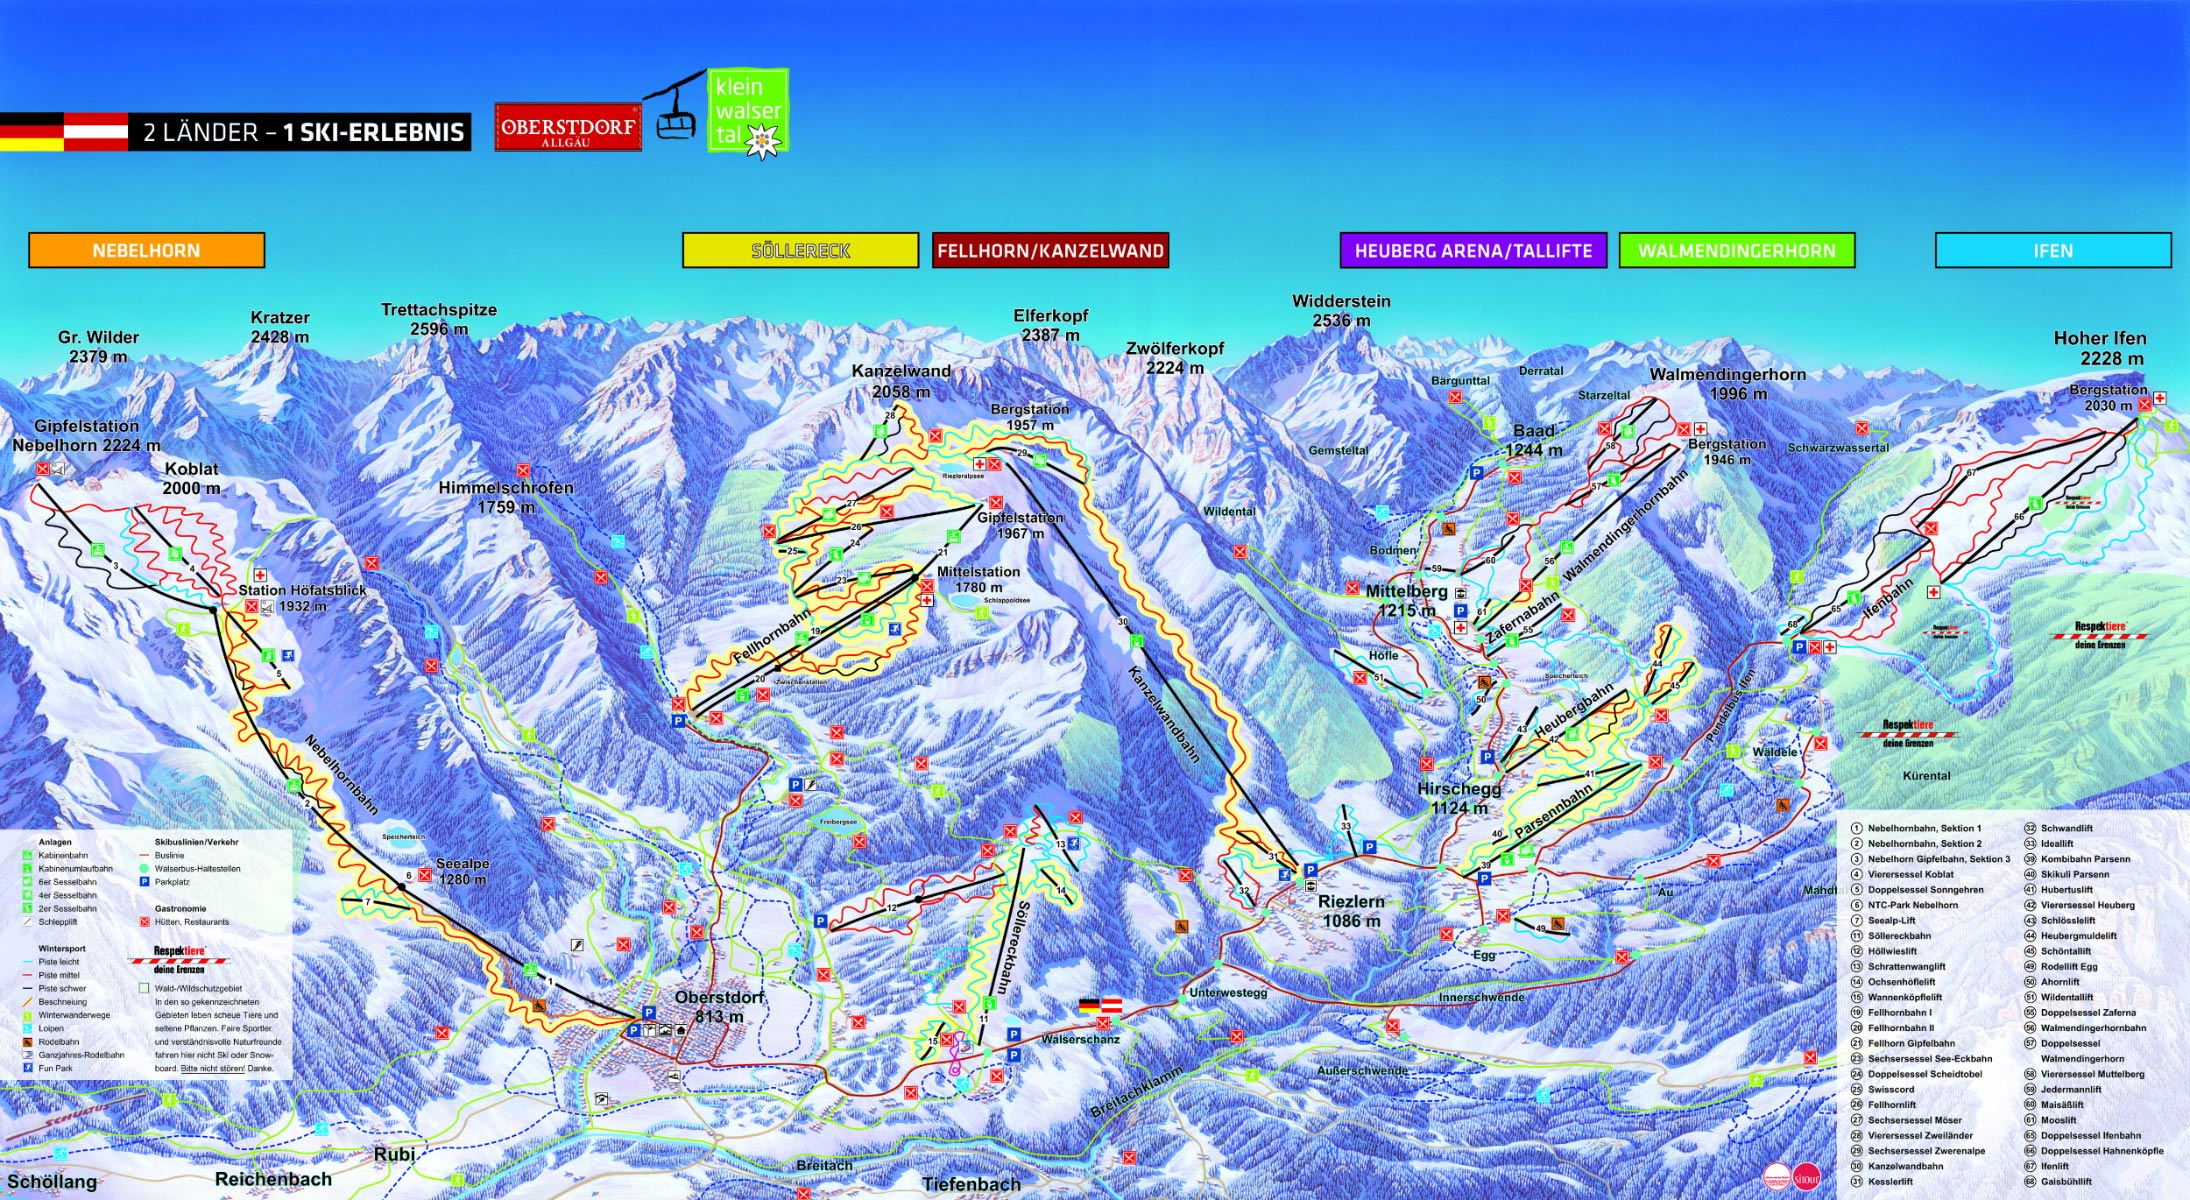 Panoramakarte Skigebiet Oberstdorf Kleiwalsertal - Hotel Bergruh - Oberstdorf Karte Deutschland